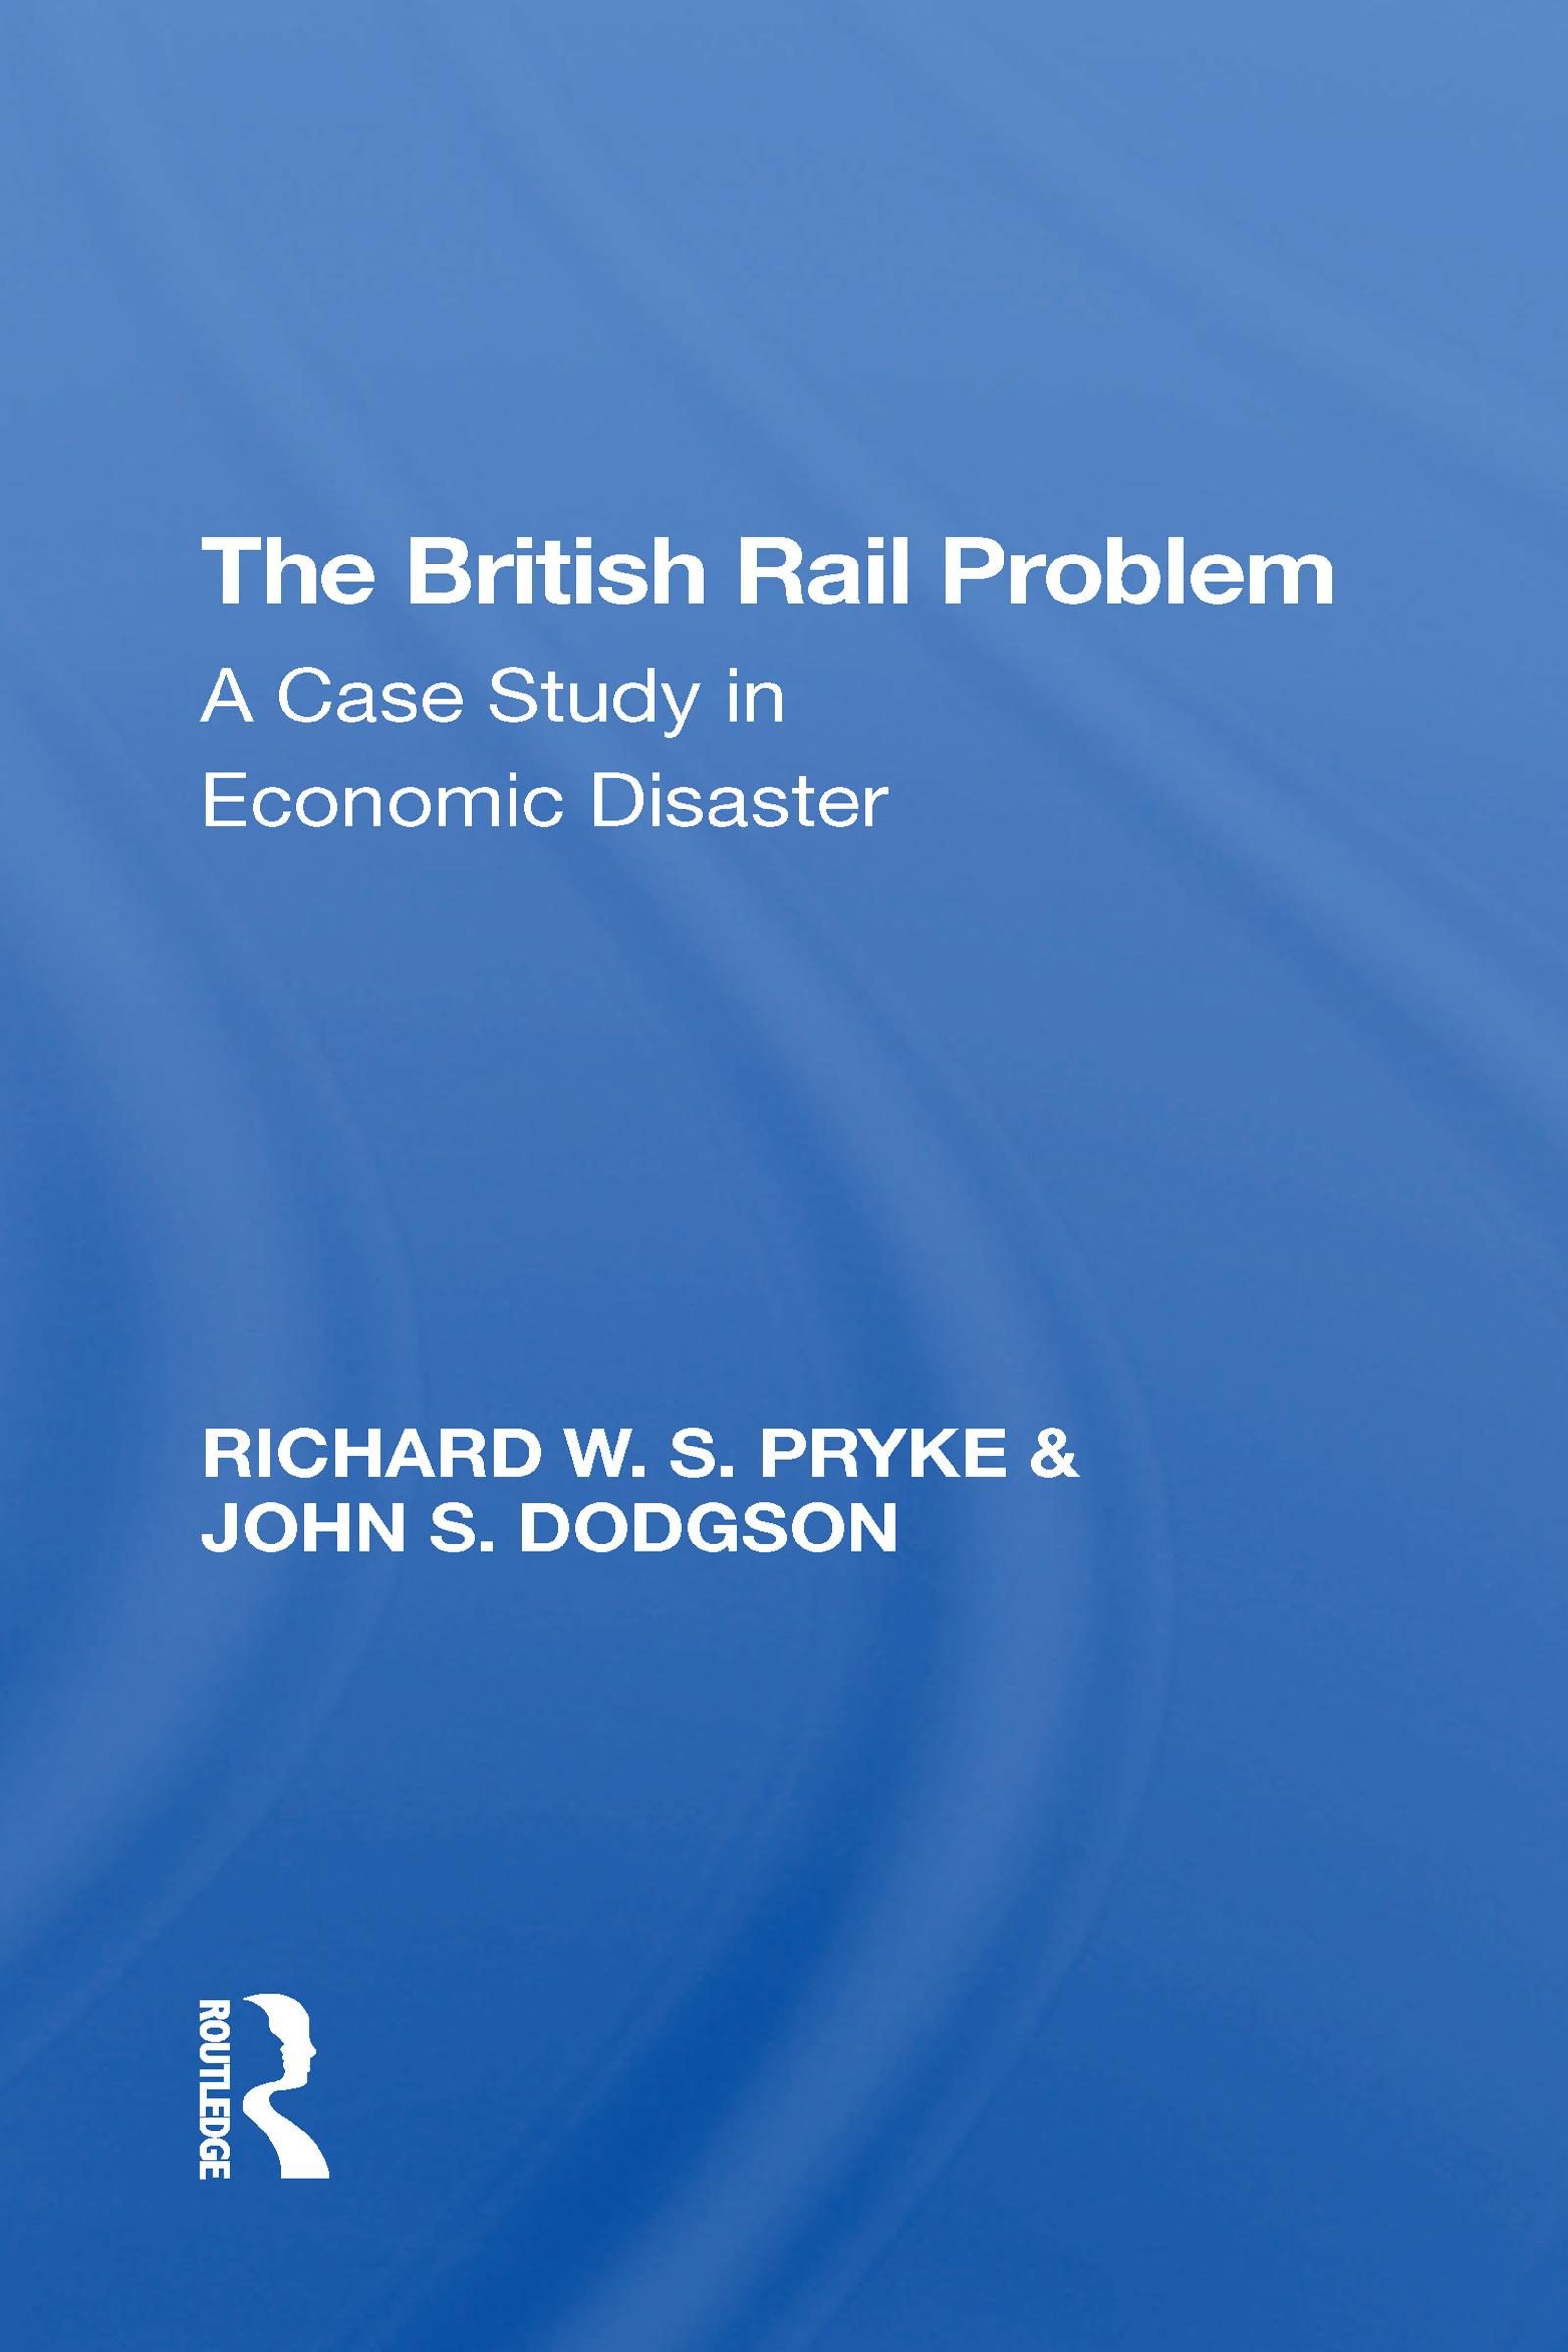 The British Rail Problem